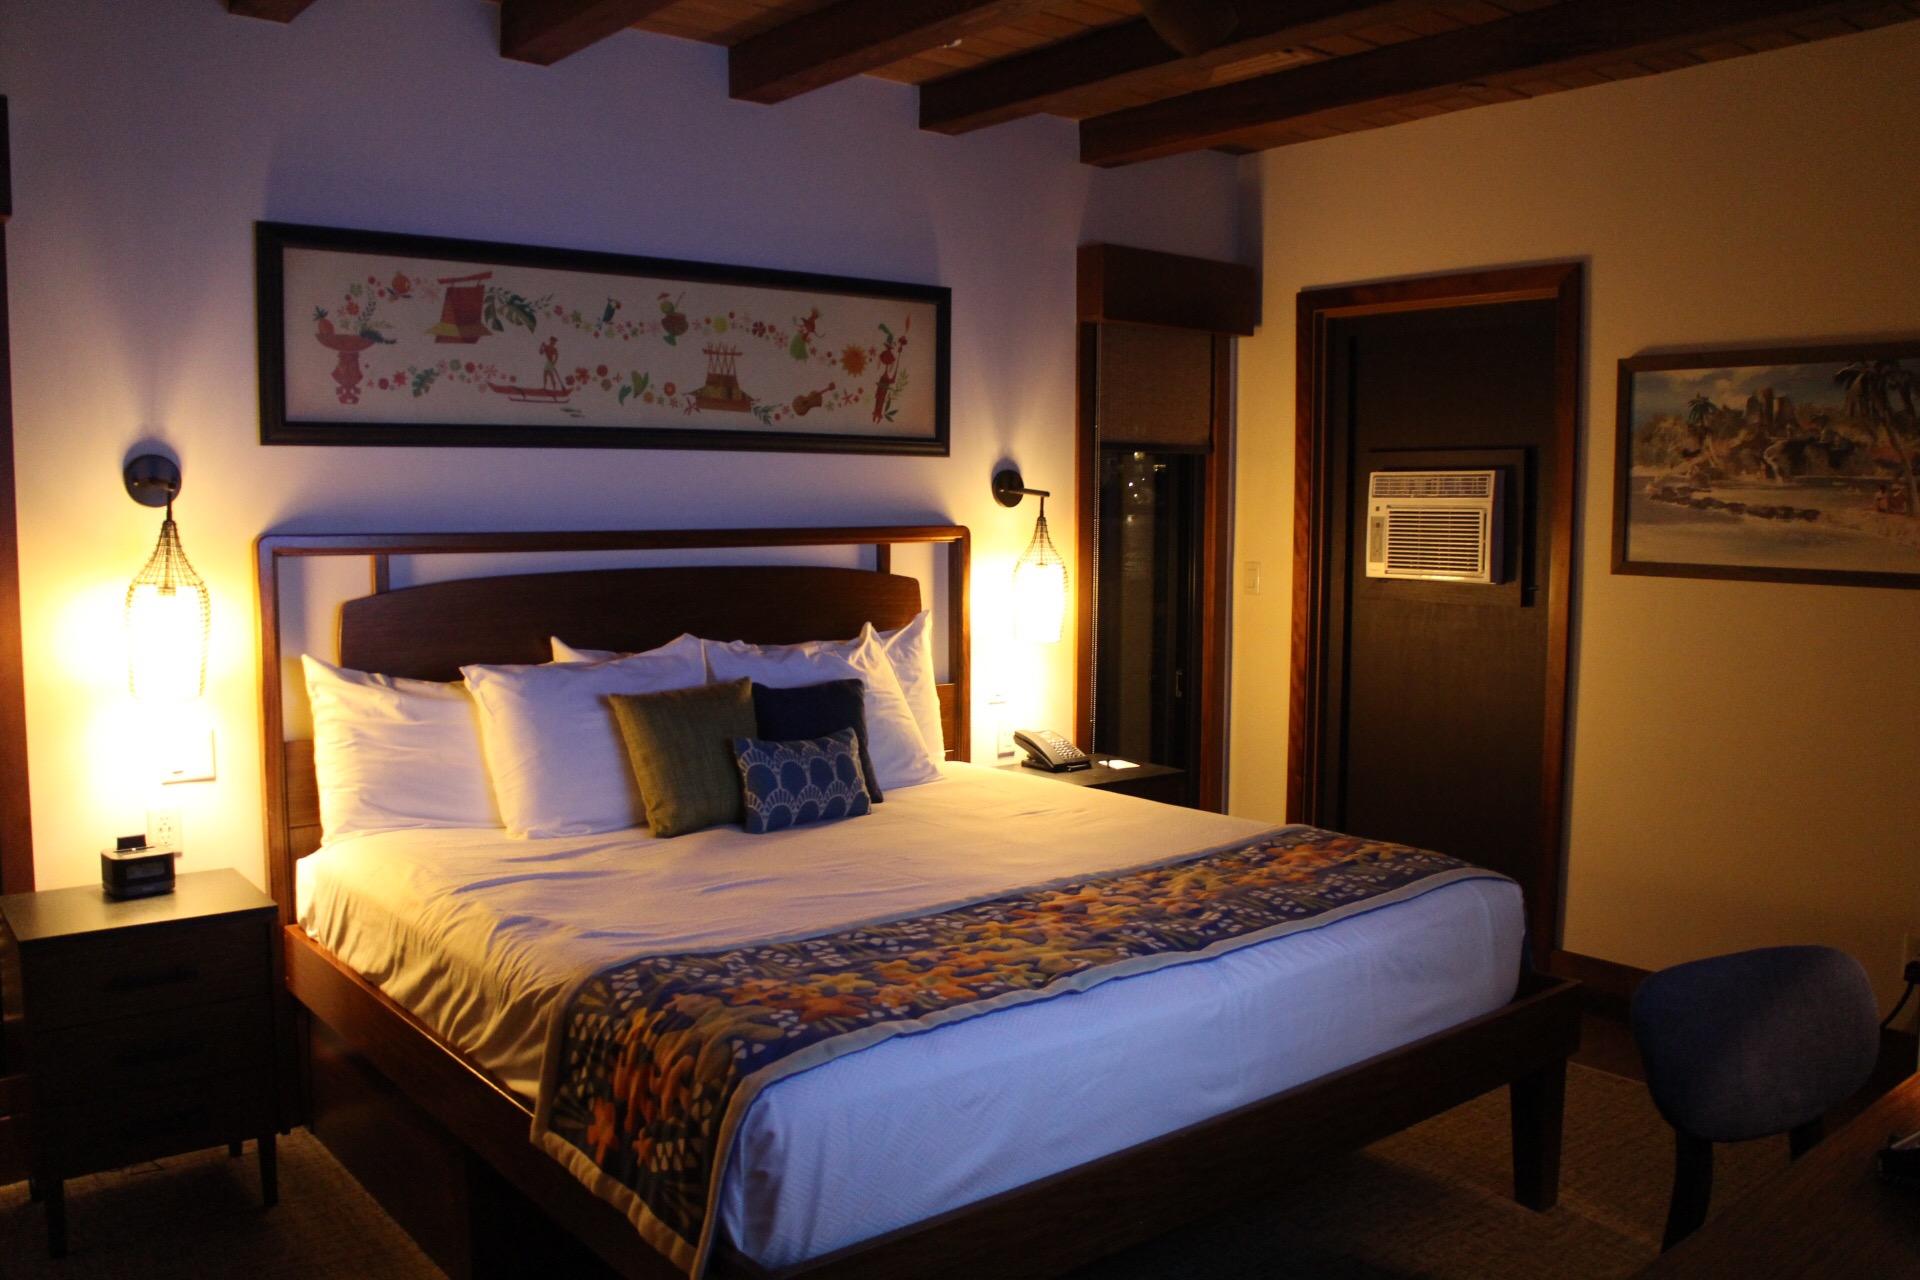 Disney's Polynesian Village Resort Bungalow